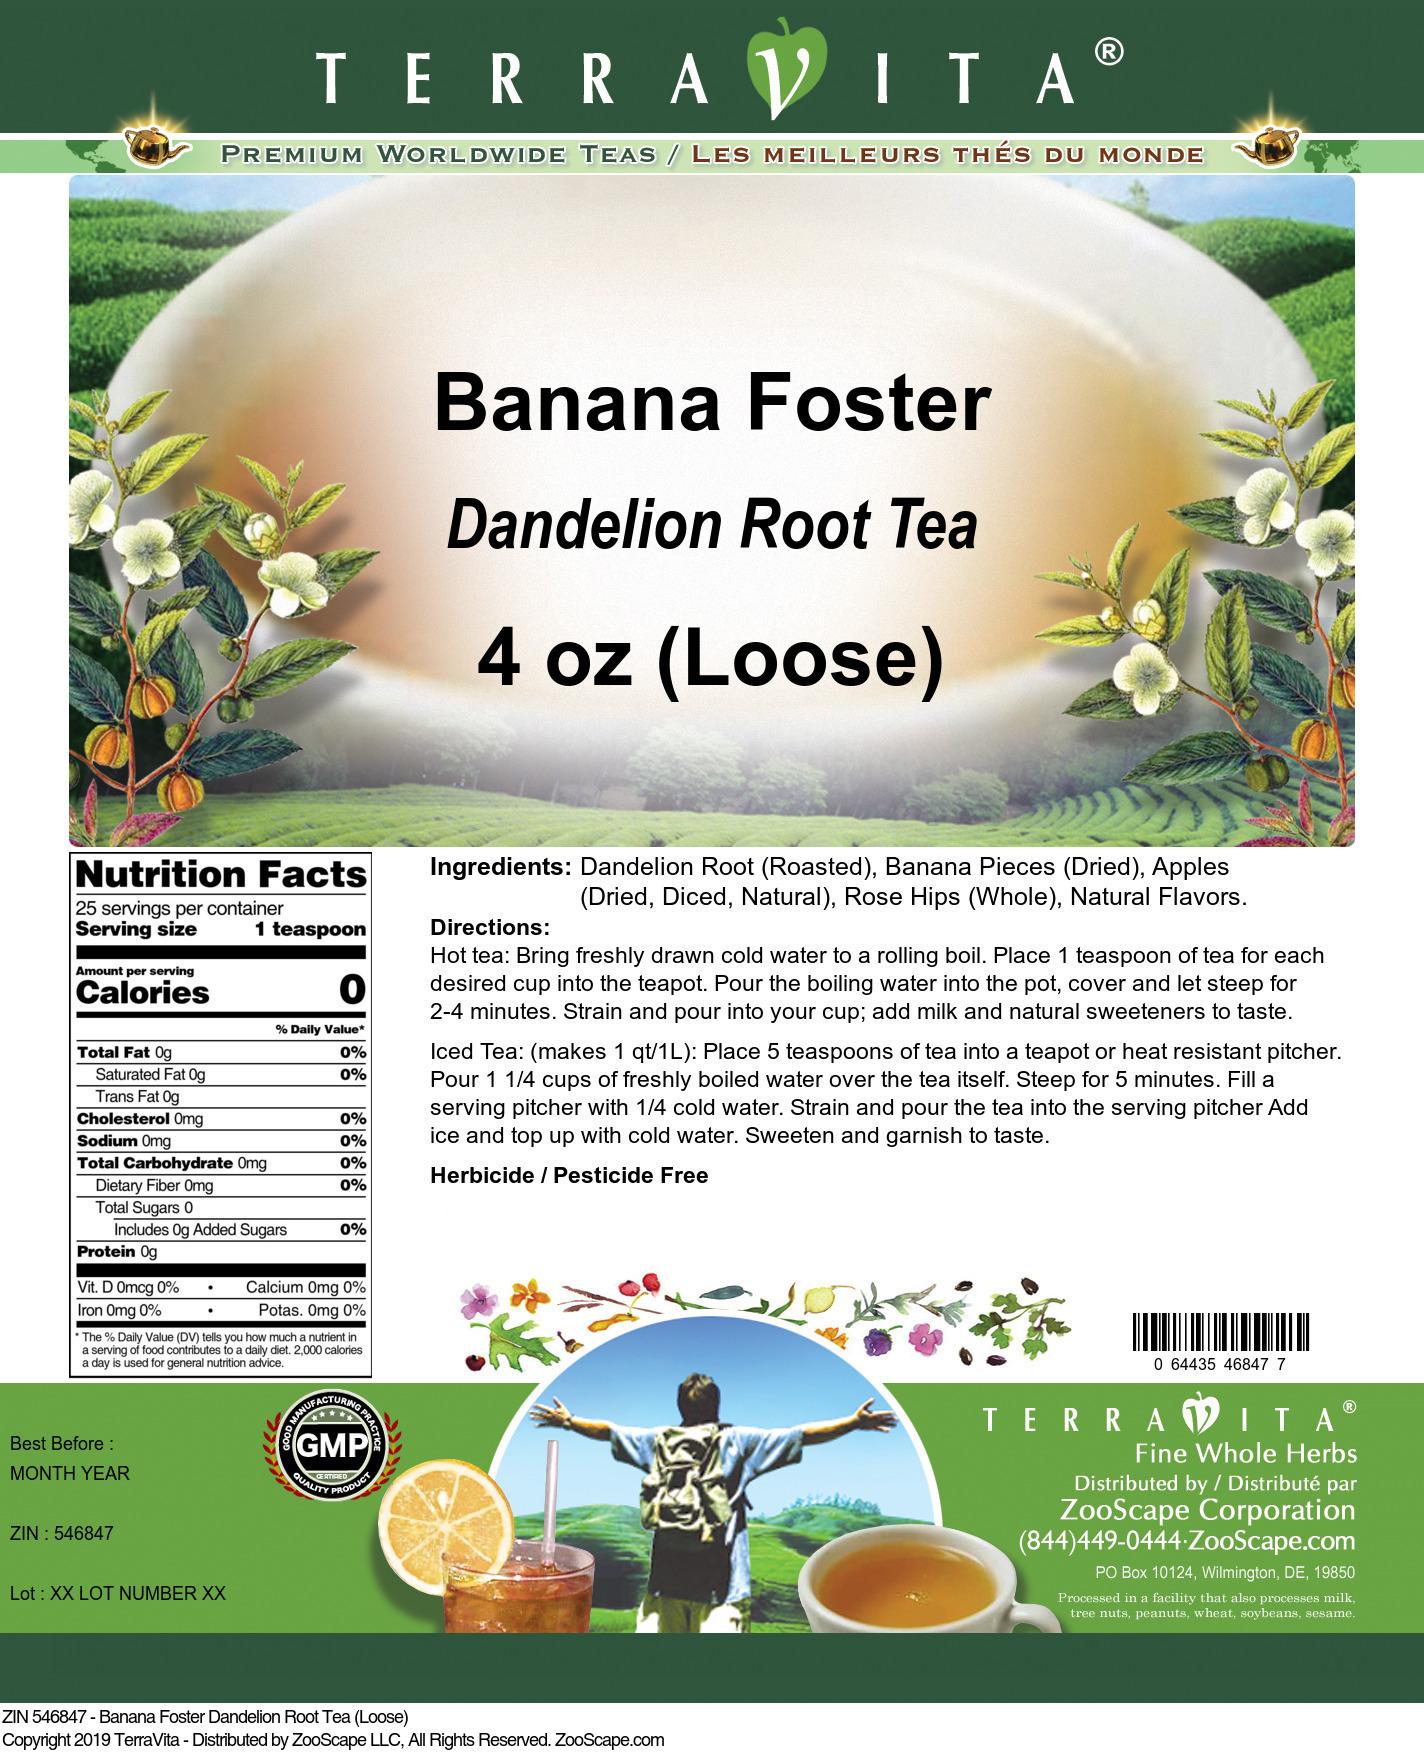 Banana Foster Dandelion Root Tea (Loose)